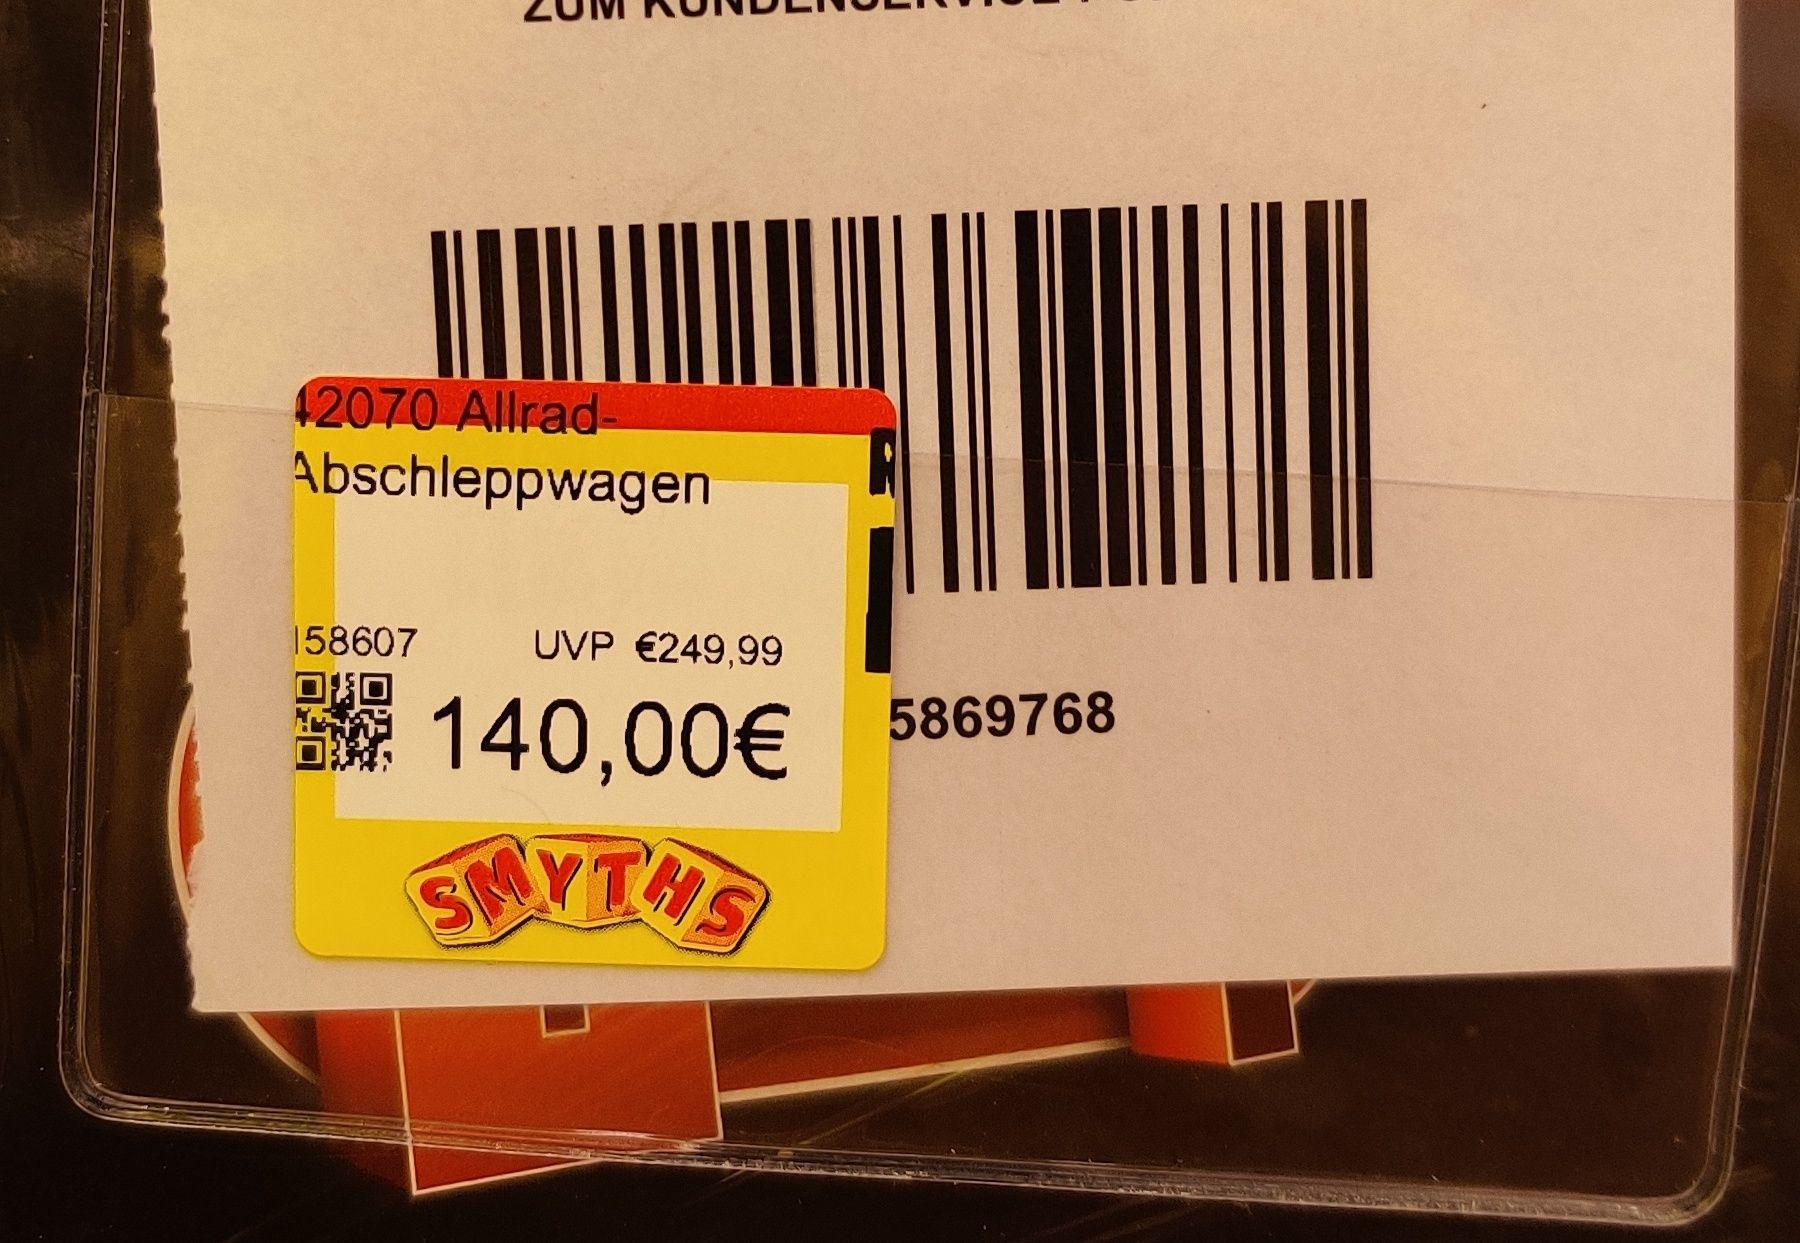 Lokal (LU) Lego 42070 Truck 140€